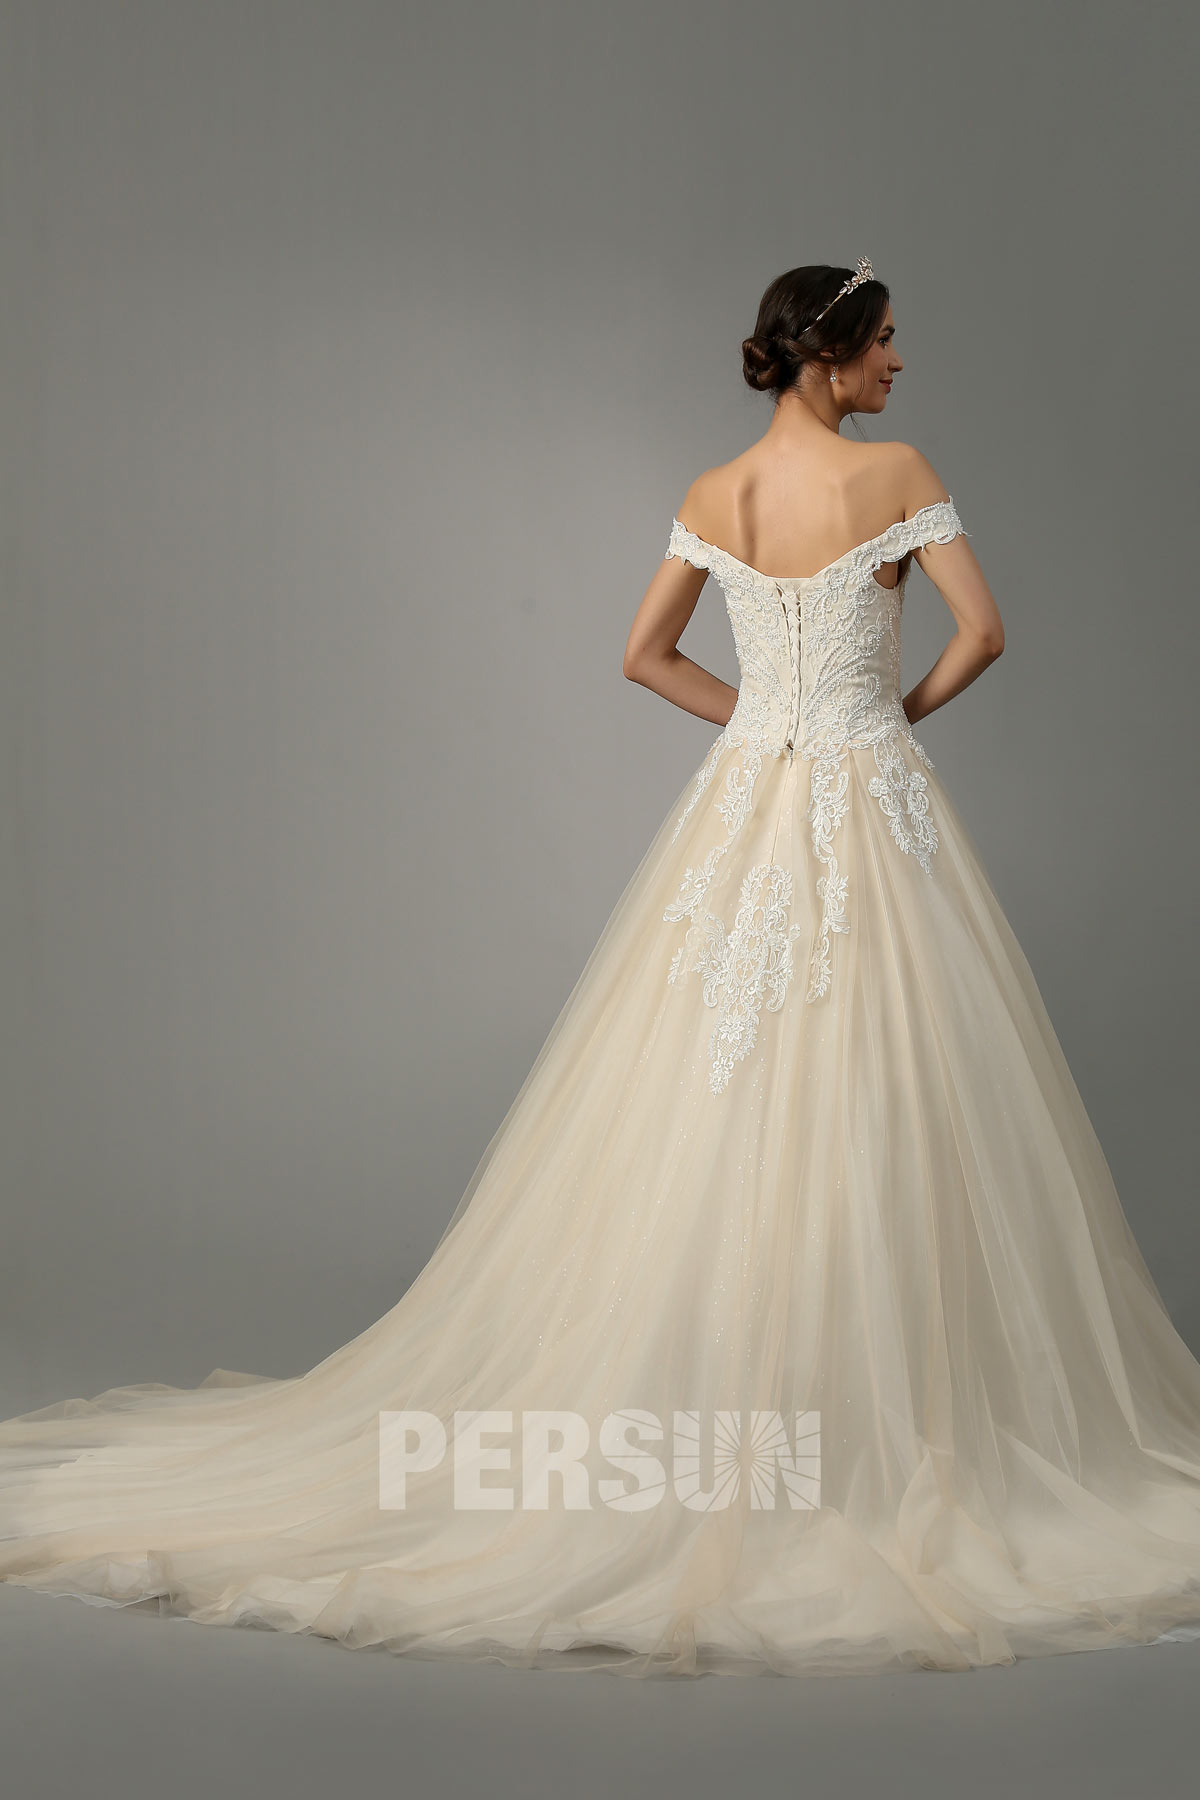 robe de mariée princesse champagne col bardot brodé de guipure perlée